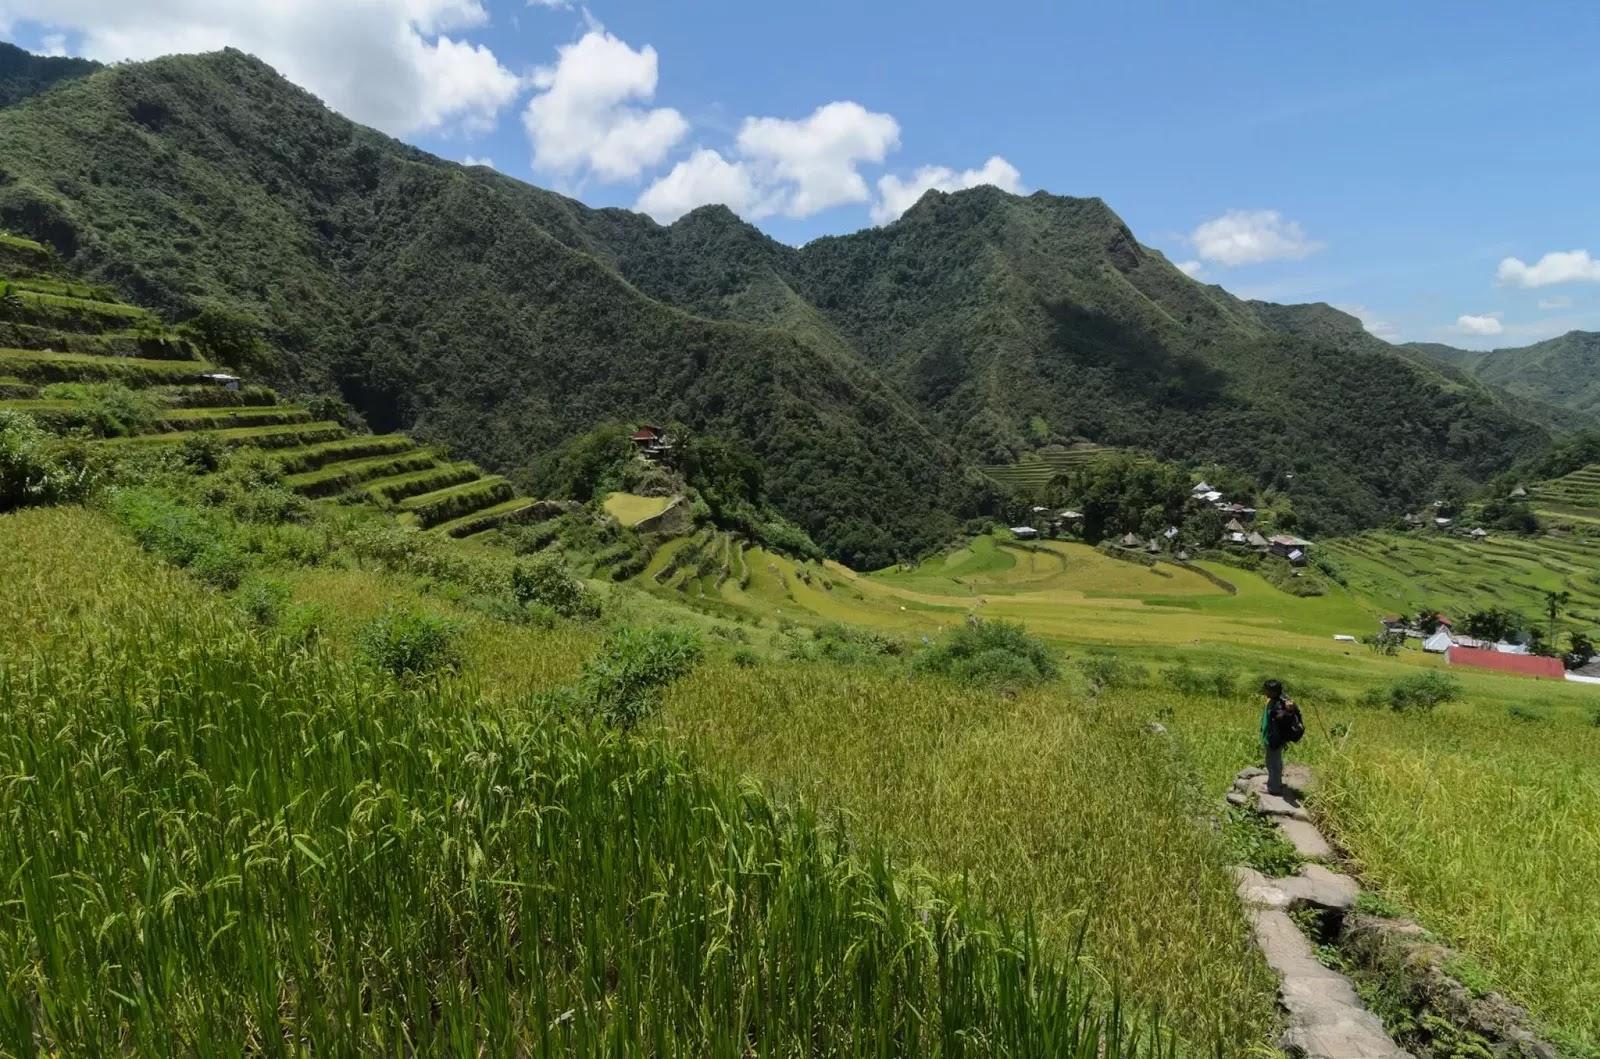 Batad Rice Terraces Under A Hot Miday Sun Ifugao Cordillera Administrative Region Philippines